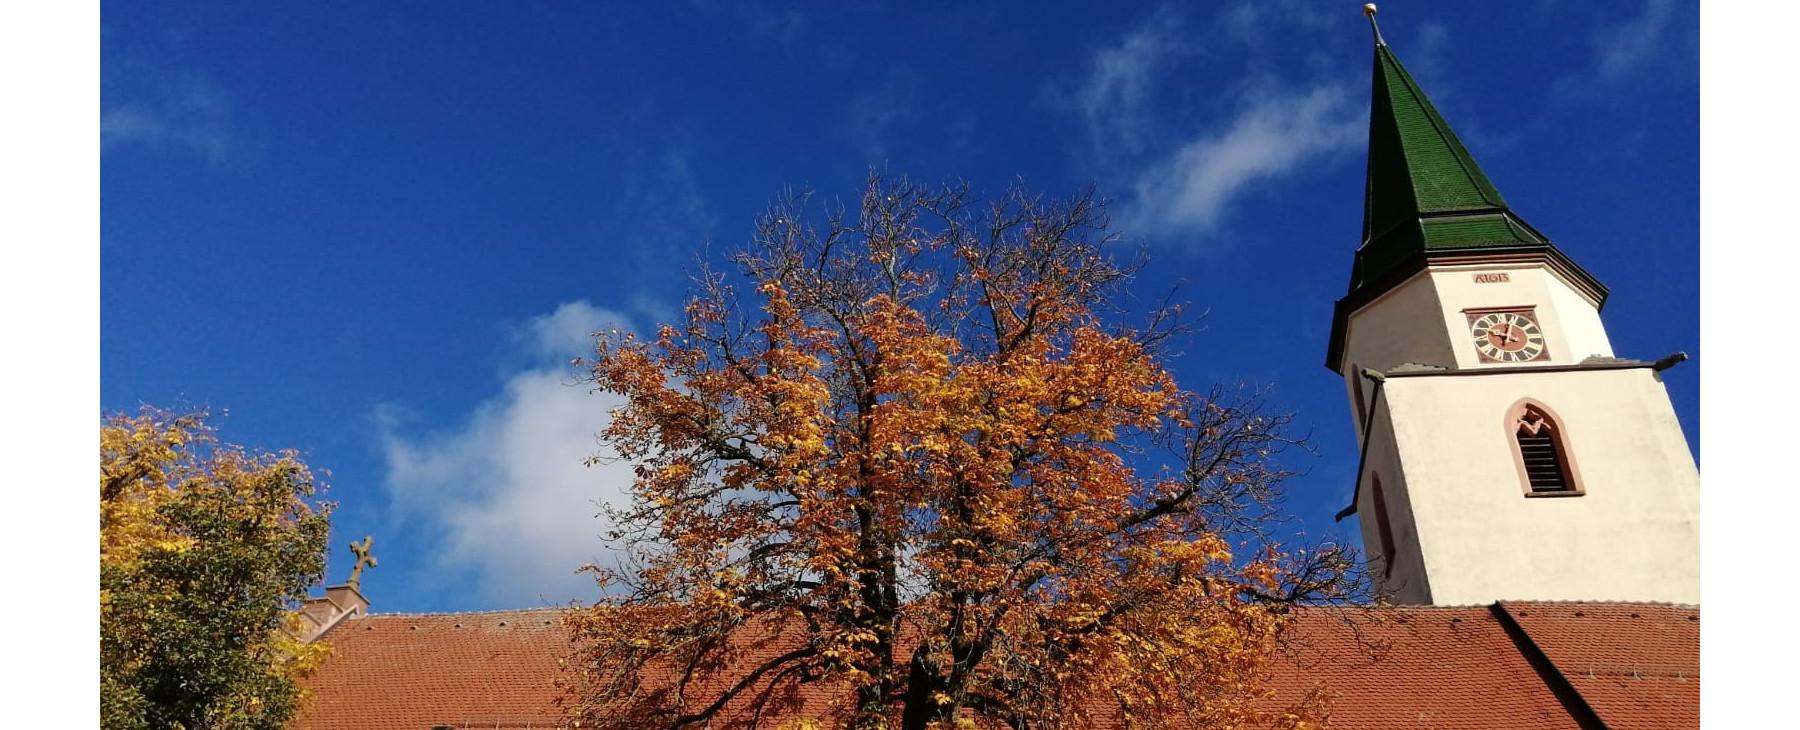 Kirchturm und Bäume mit Herbstlaub